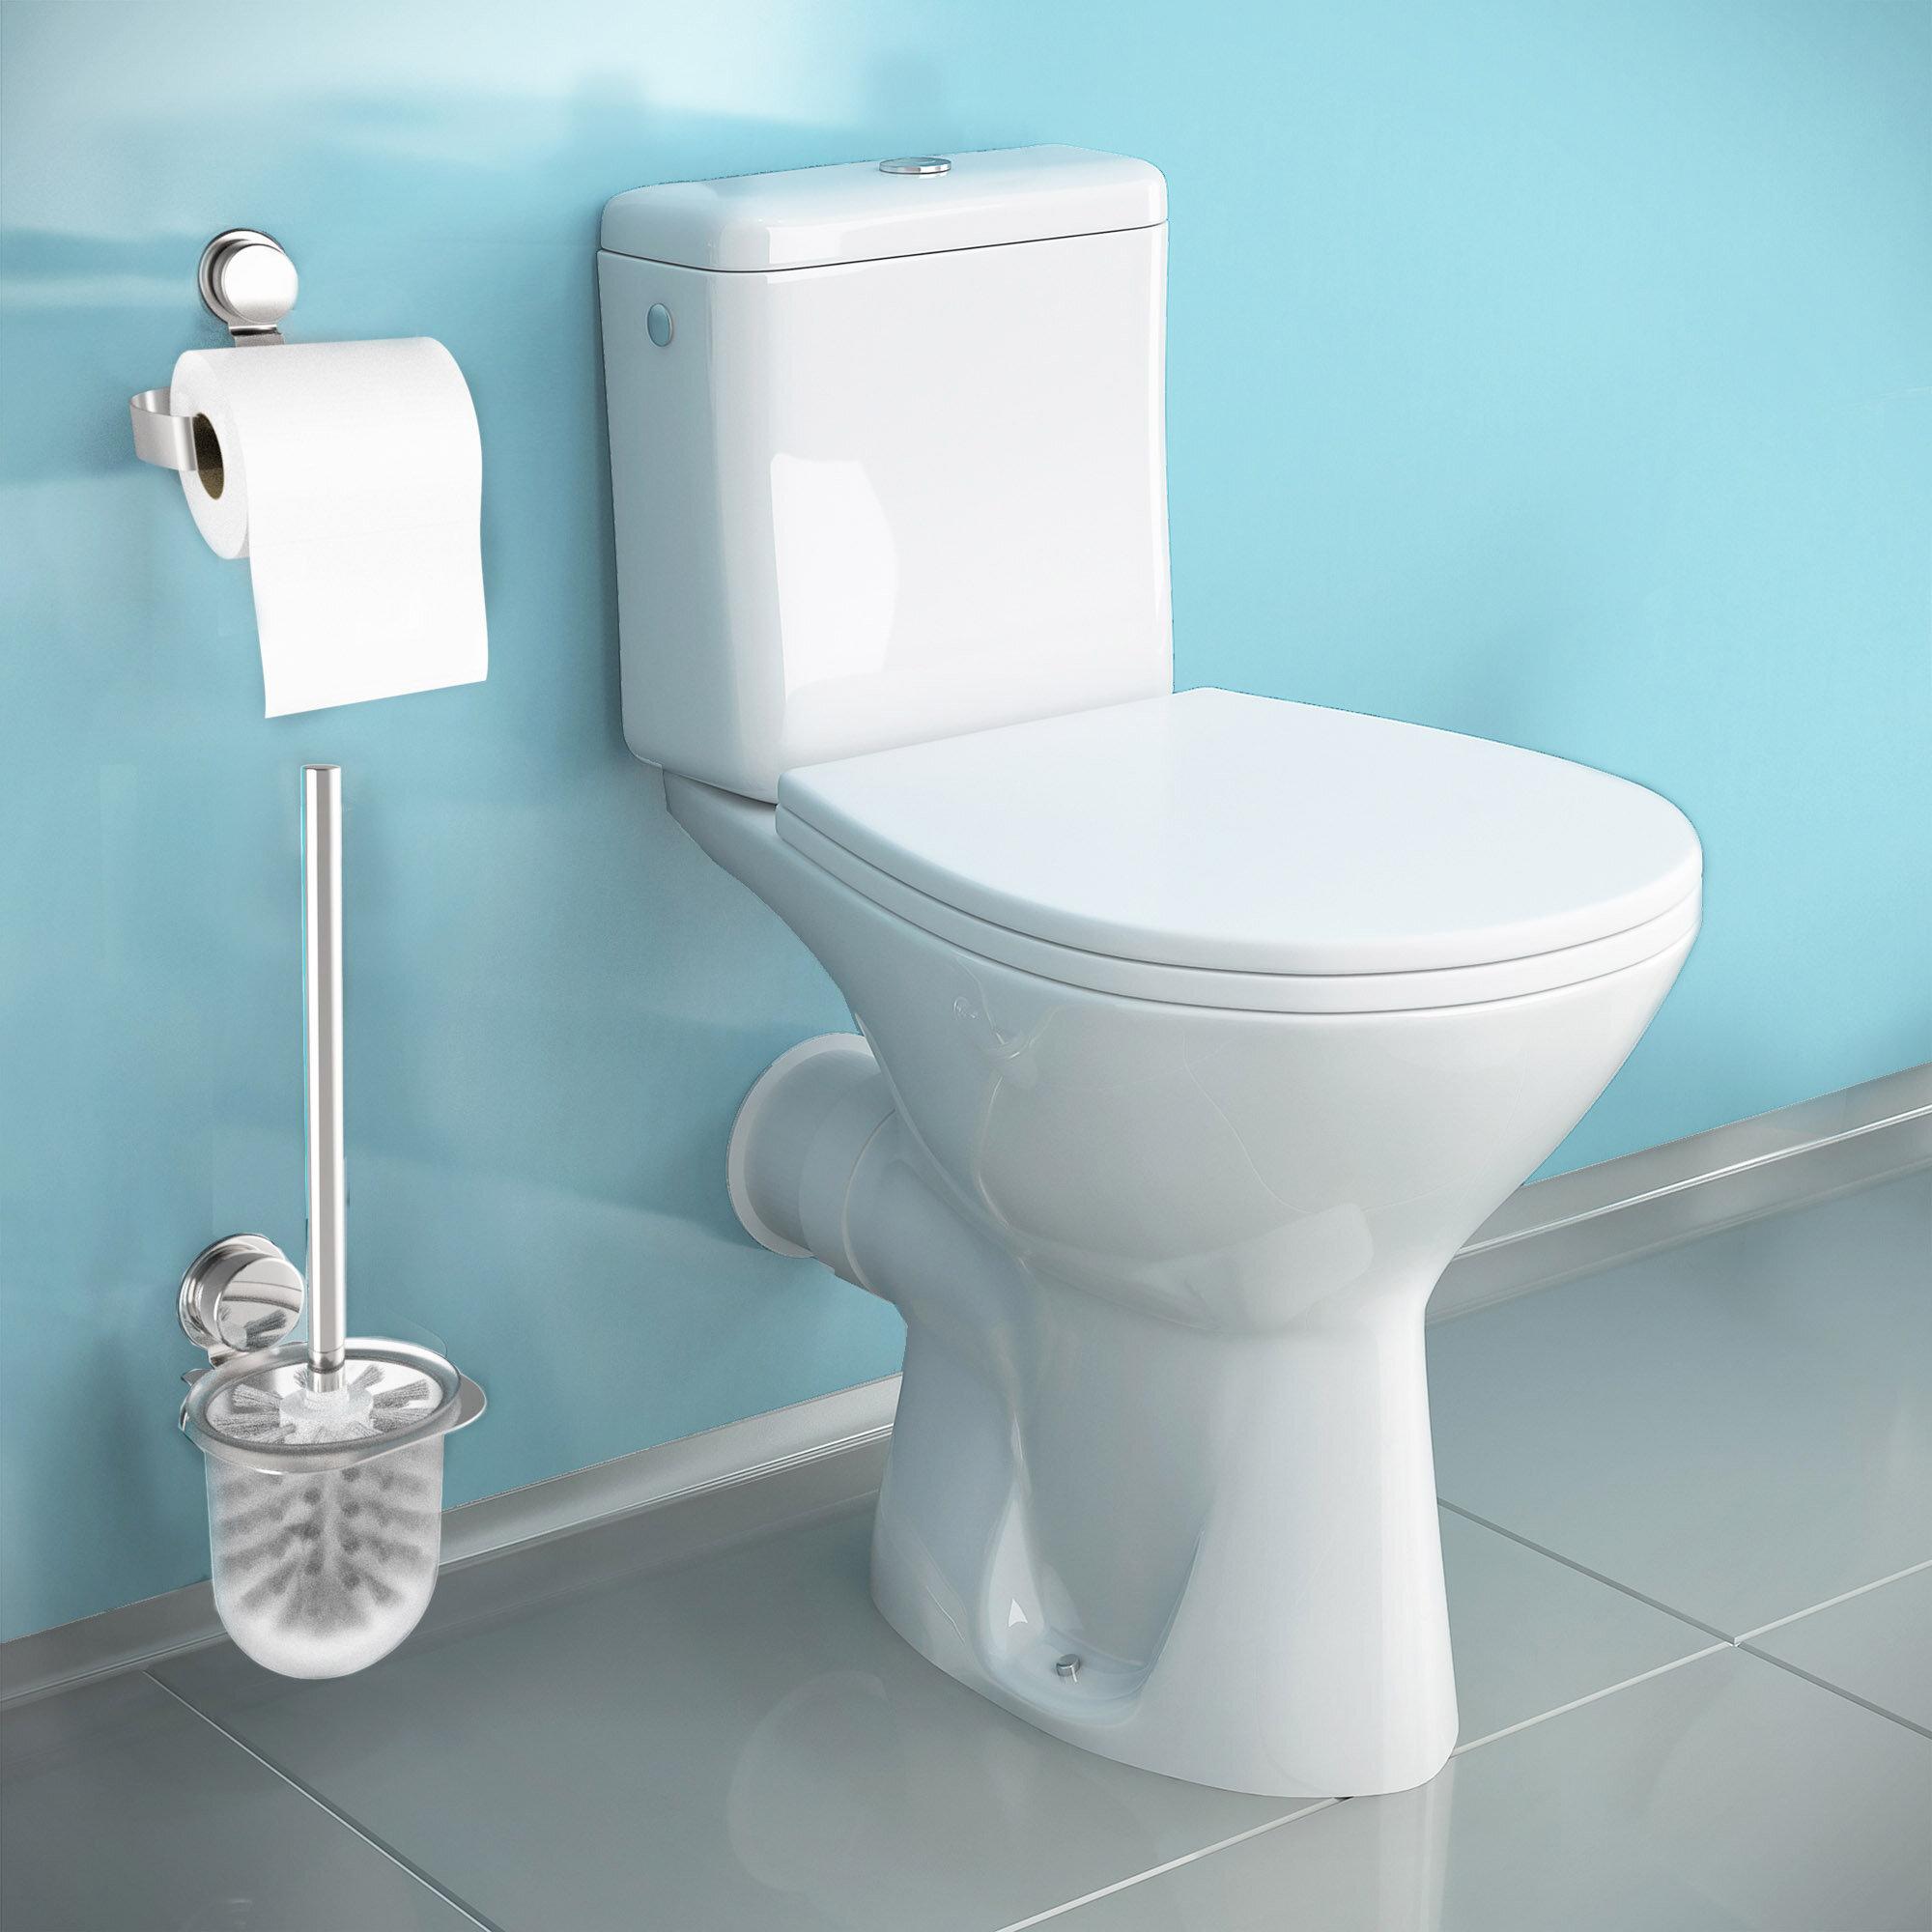 Lavish Home Wall Mount Toilet Paper Holder | Wayfair